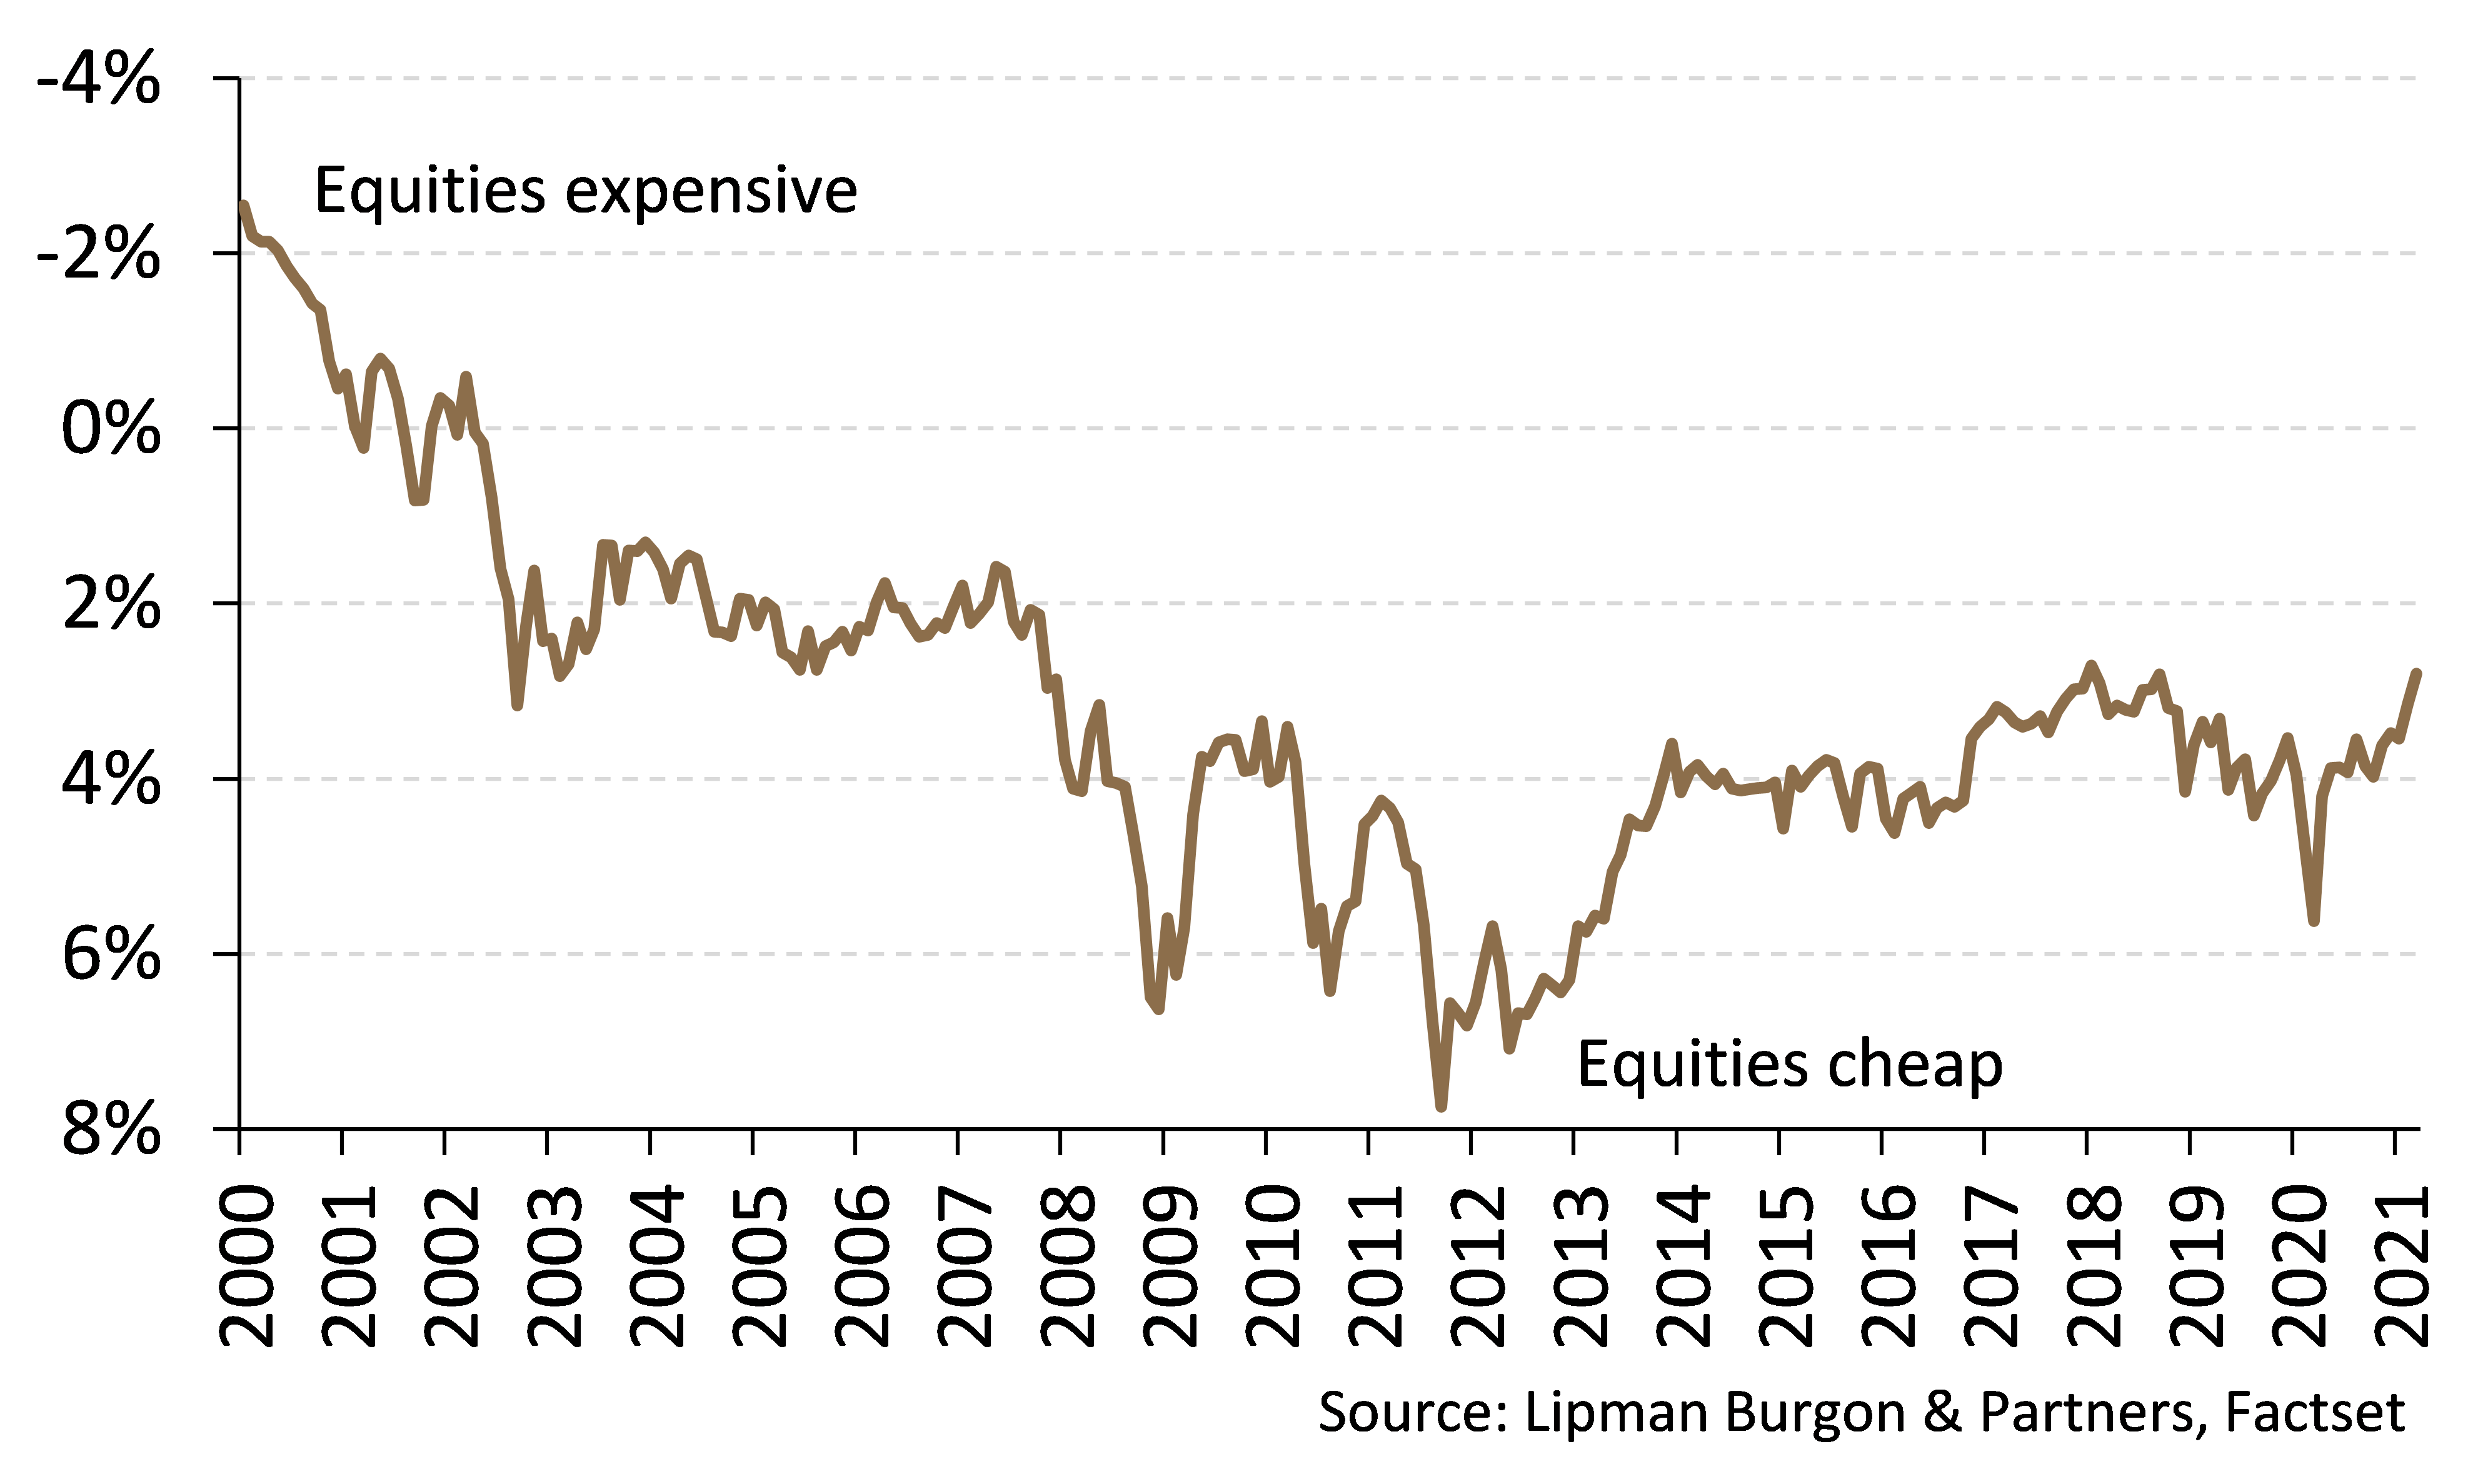 Equity valuations still reasonable